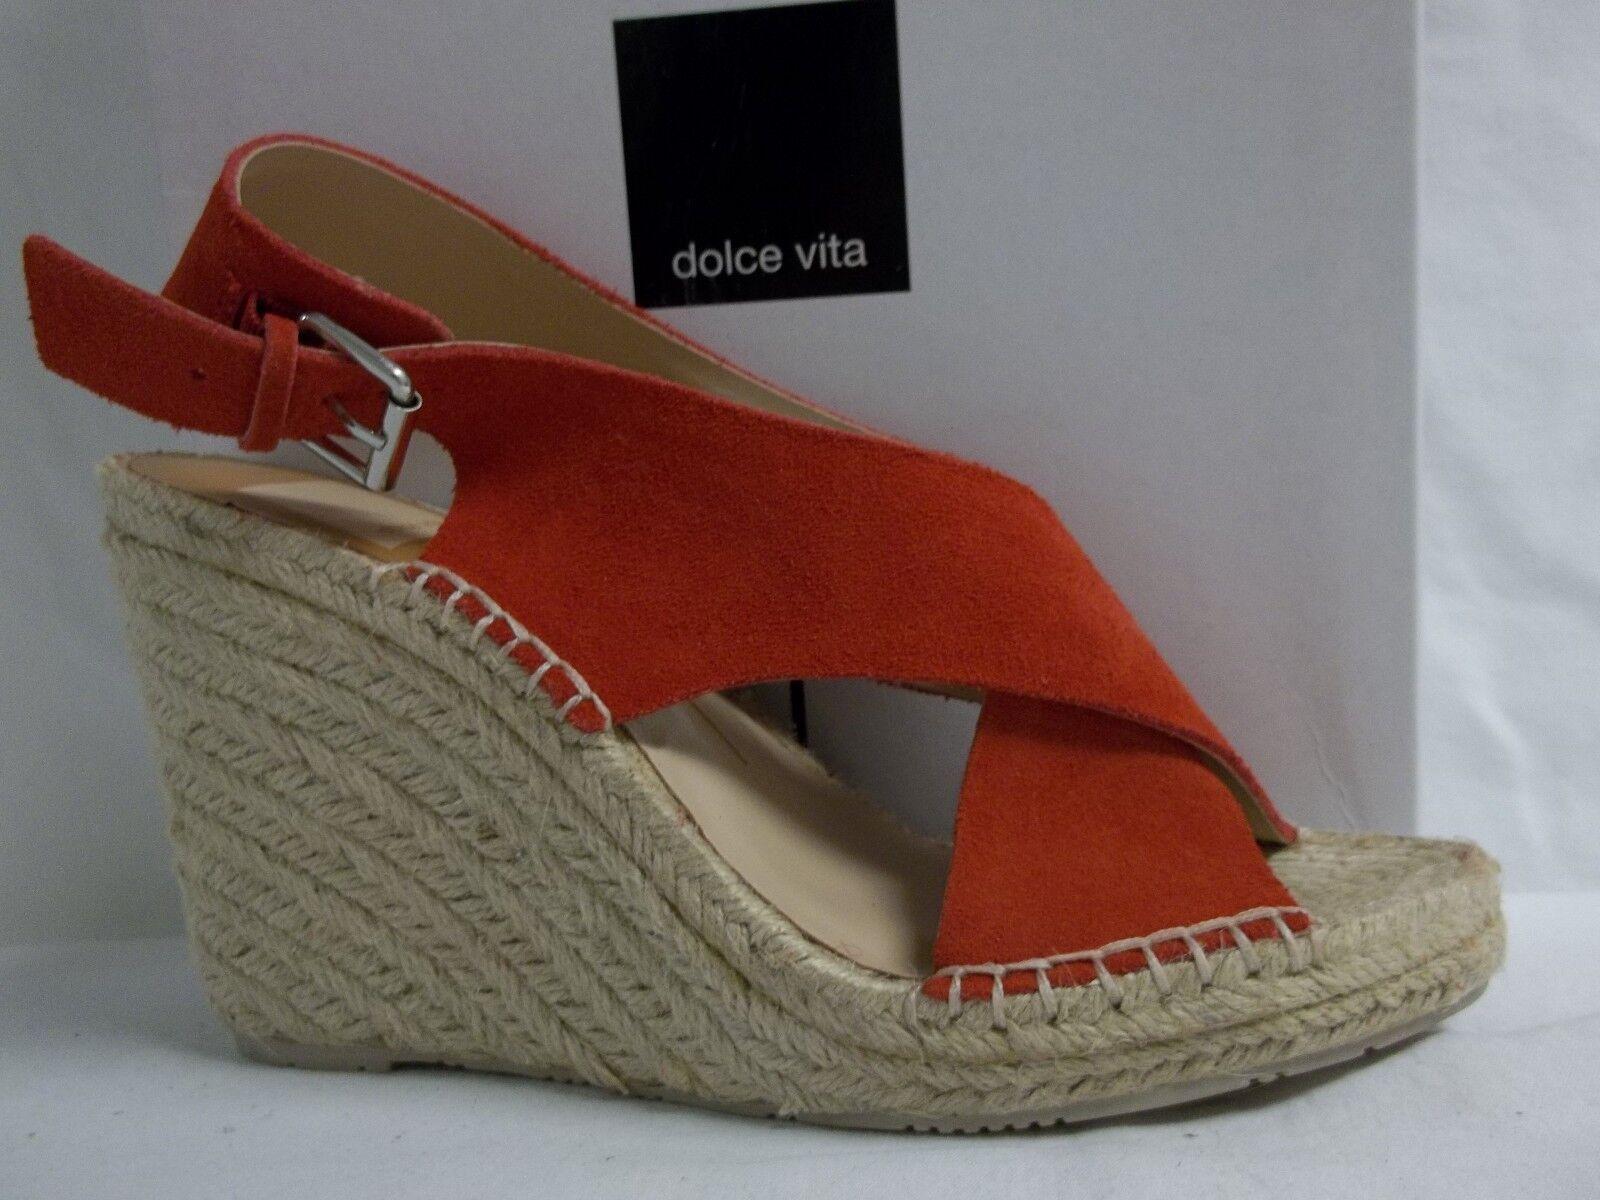 Dolce Vita Größe 8.5 M Sovay Coral Suede Slingbacks Wedges NEU Damenschuhe Schuhes